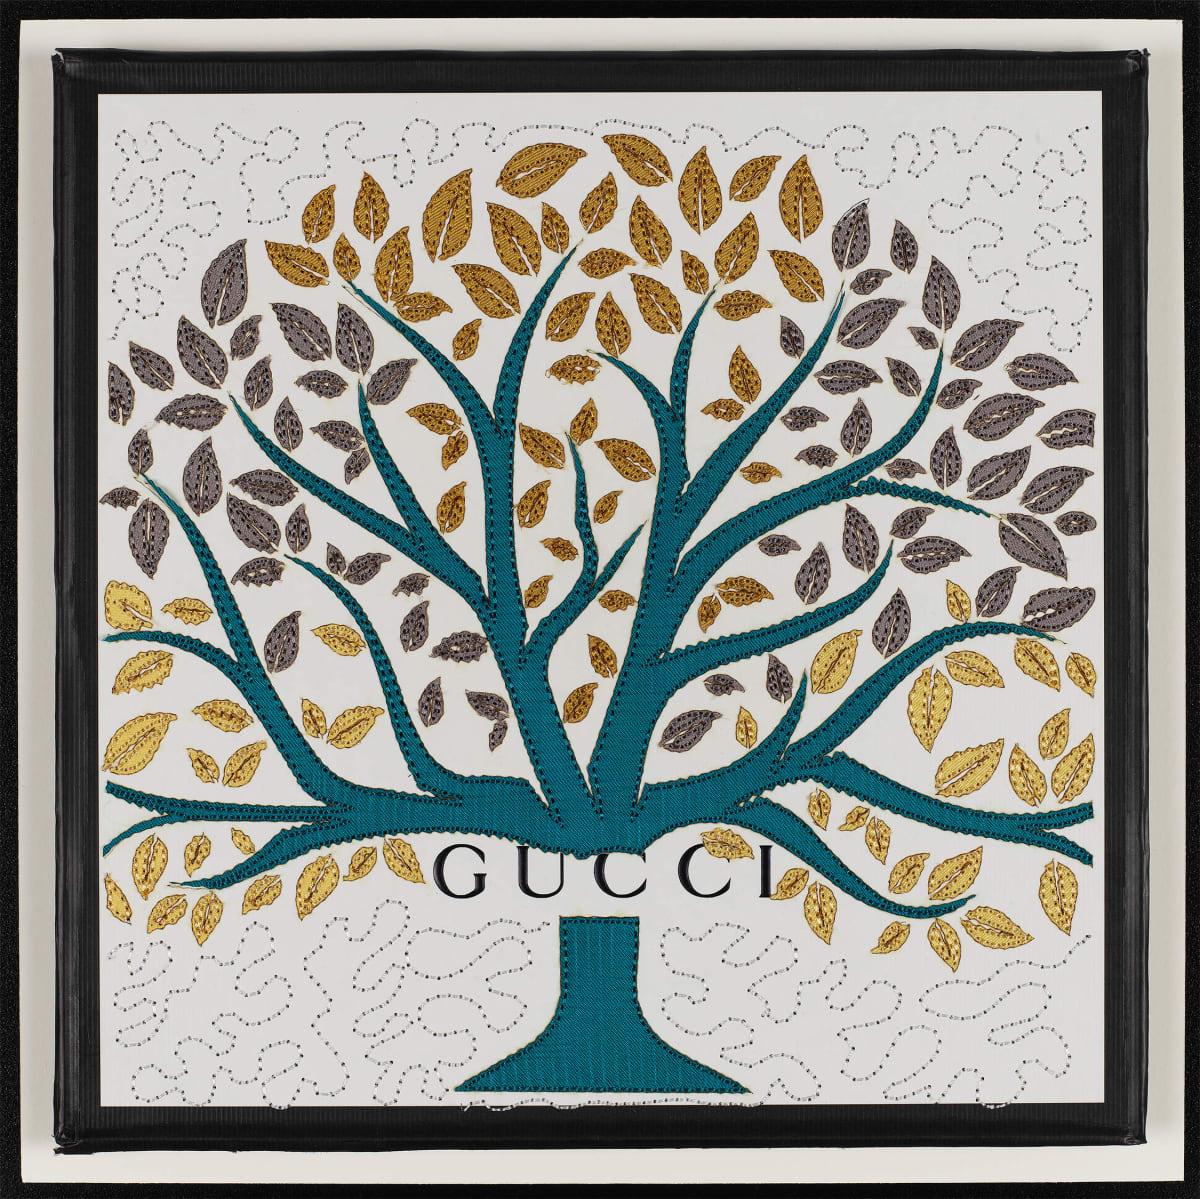 Stephen Wilson, Gucci Tree (Teal), 2019